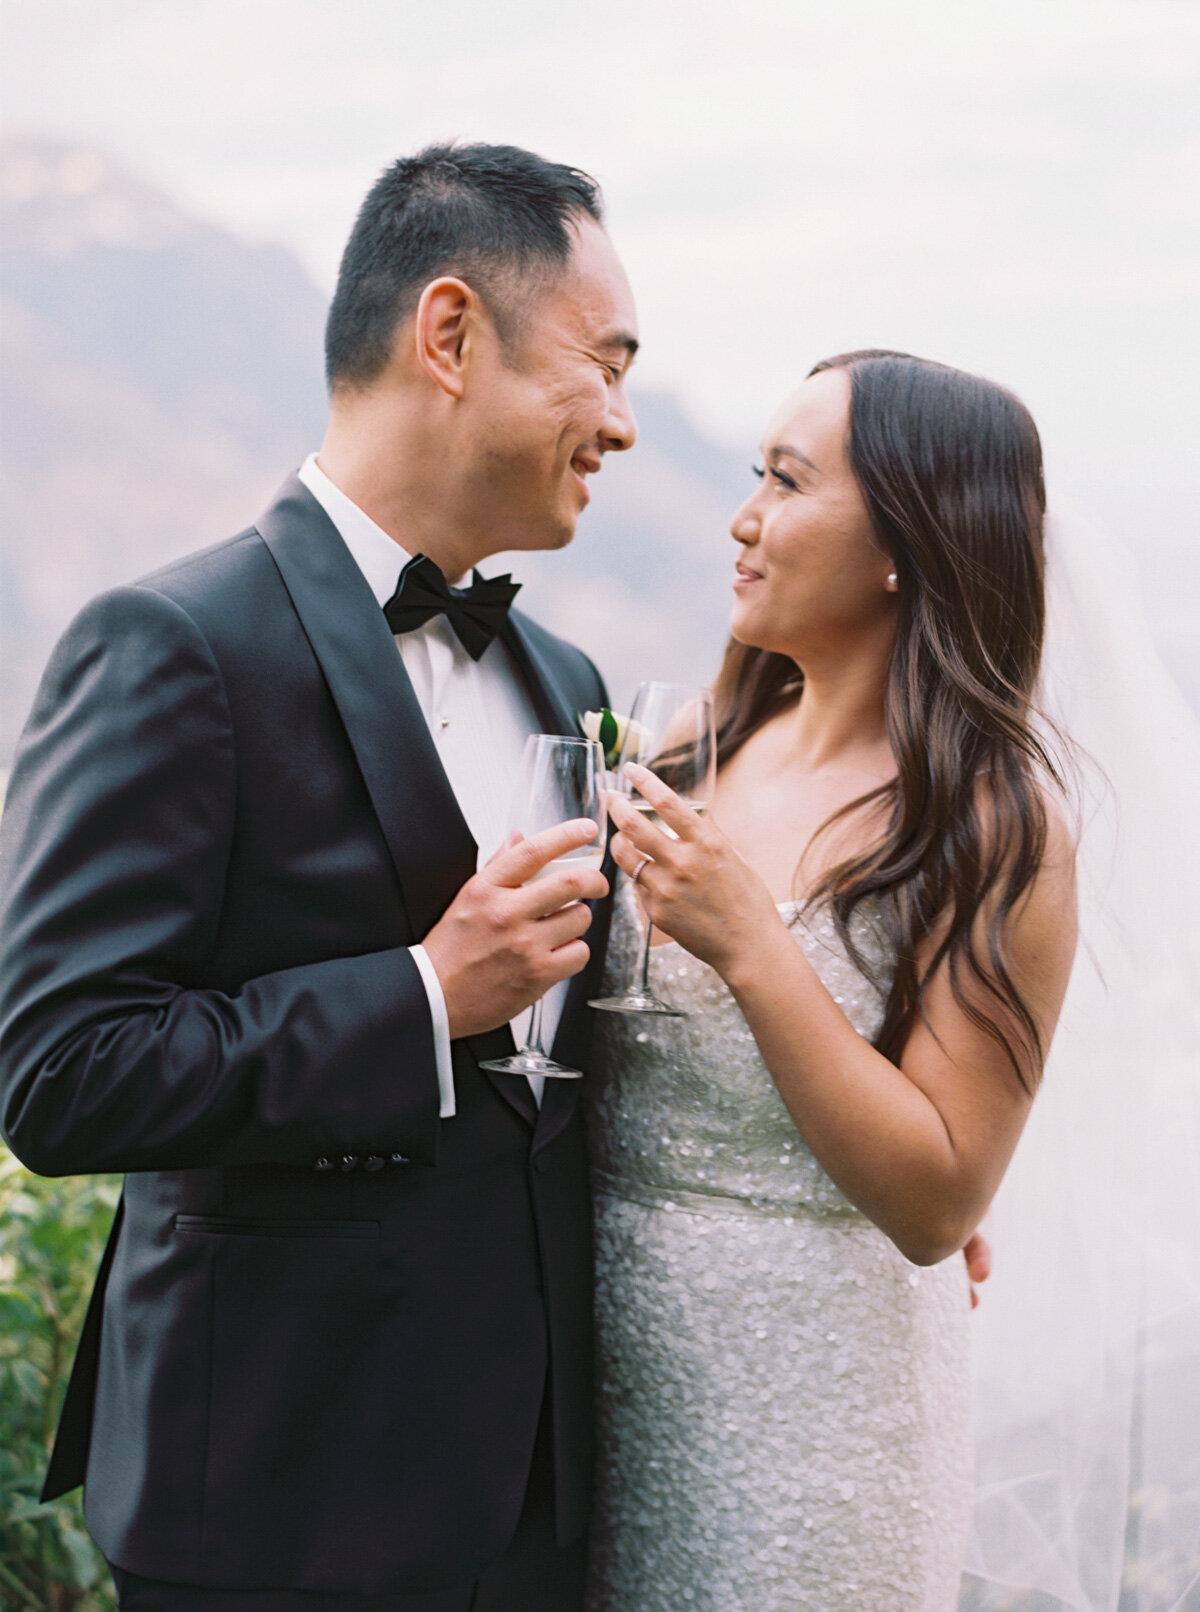 Belmond-Hotel-Caruso-ravello-elopement-Katie-Grant-destination-wedding (37 of 50).jpg